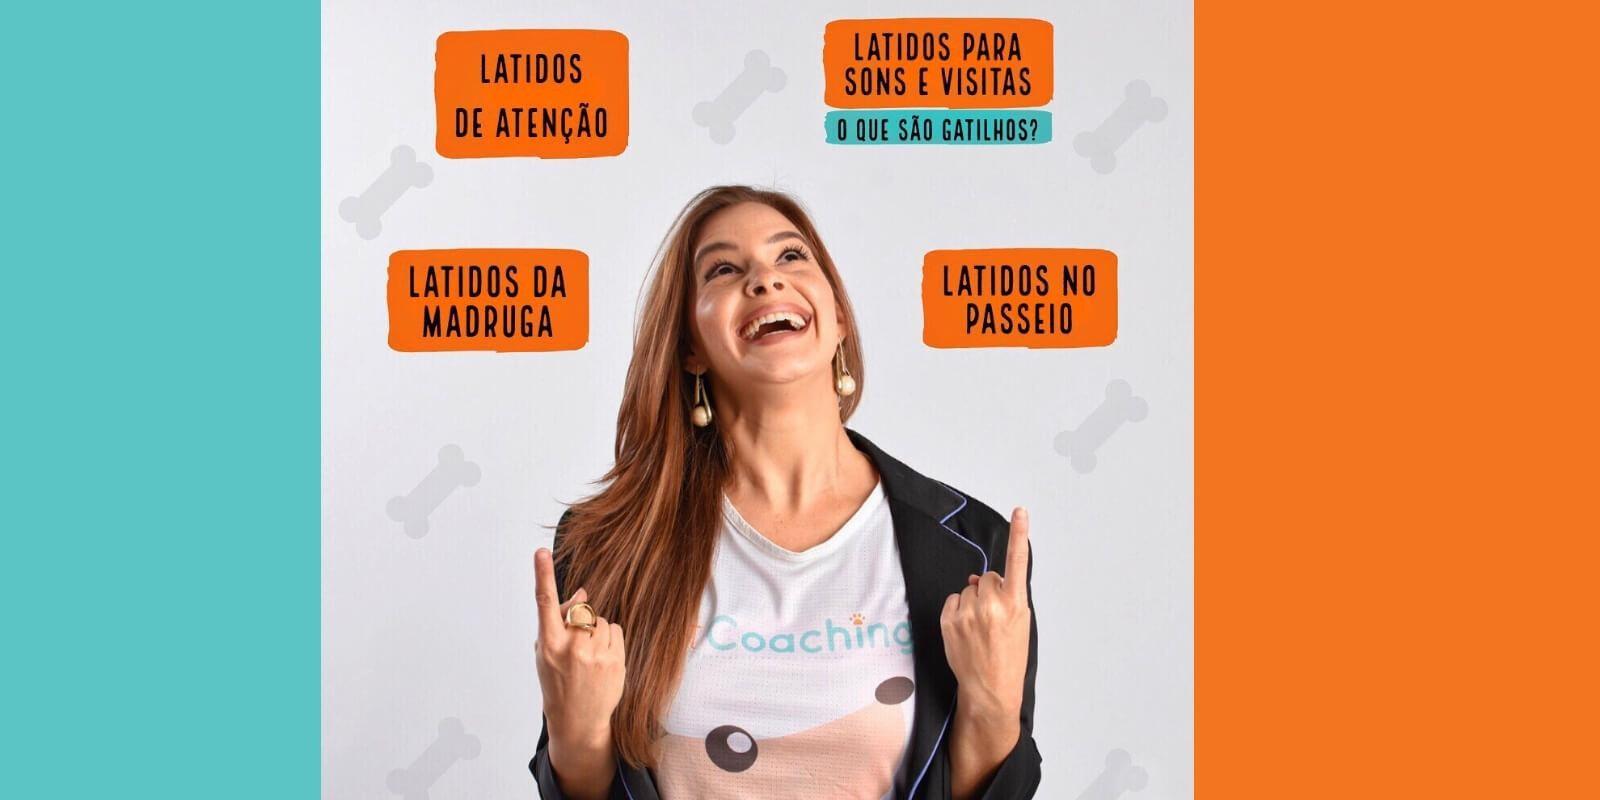 Lambeijos, Carla Ruas - Tipos de Latidos